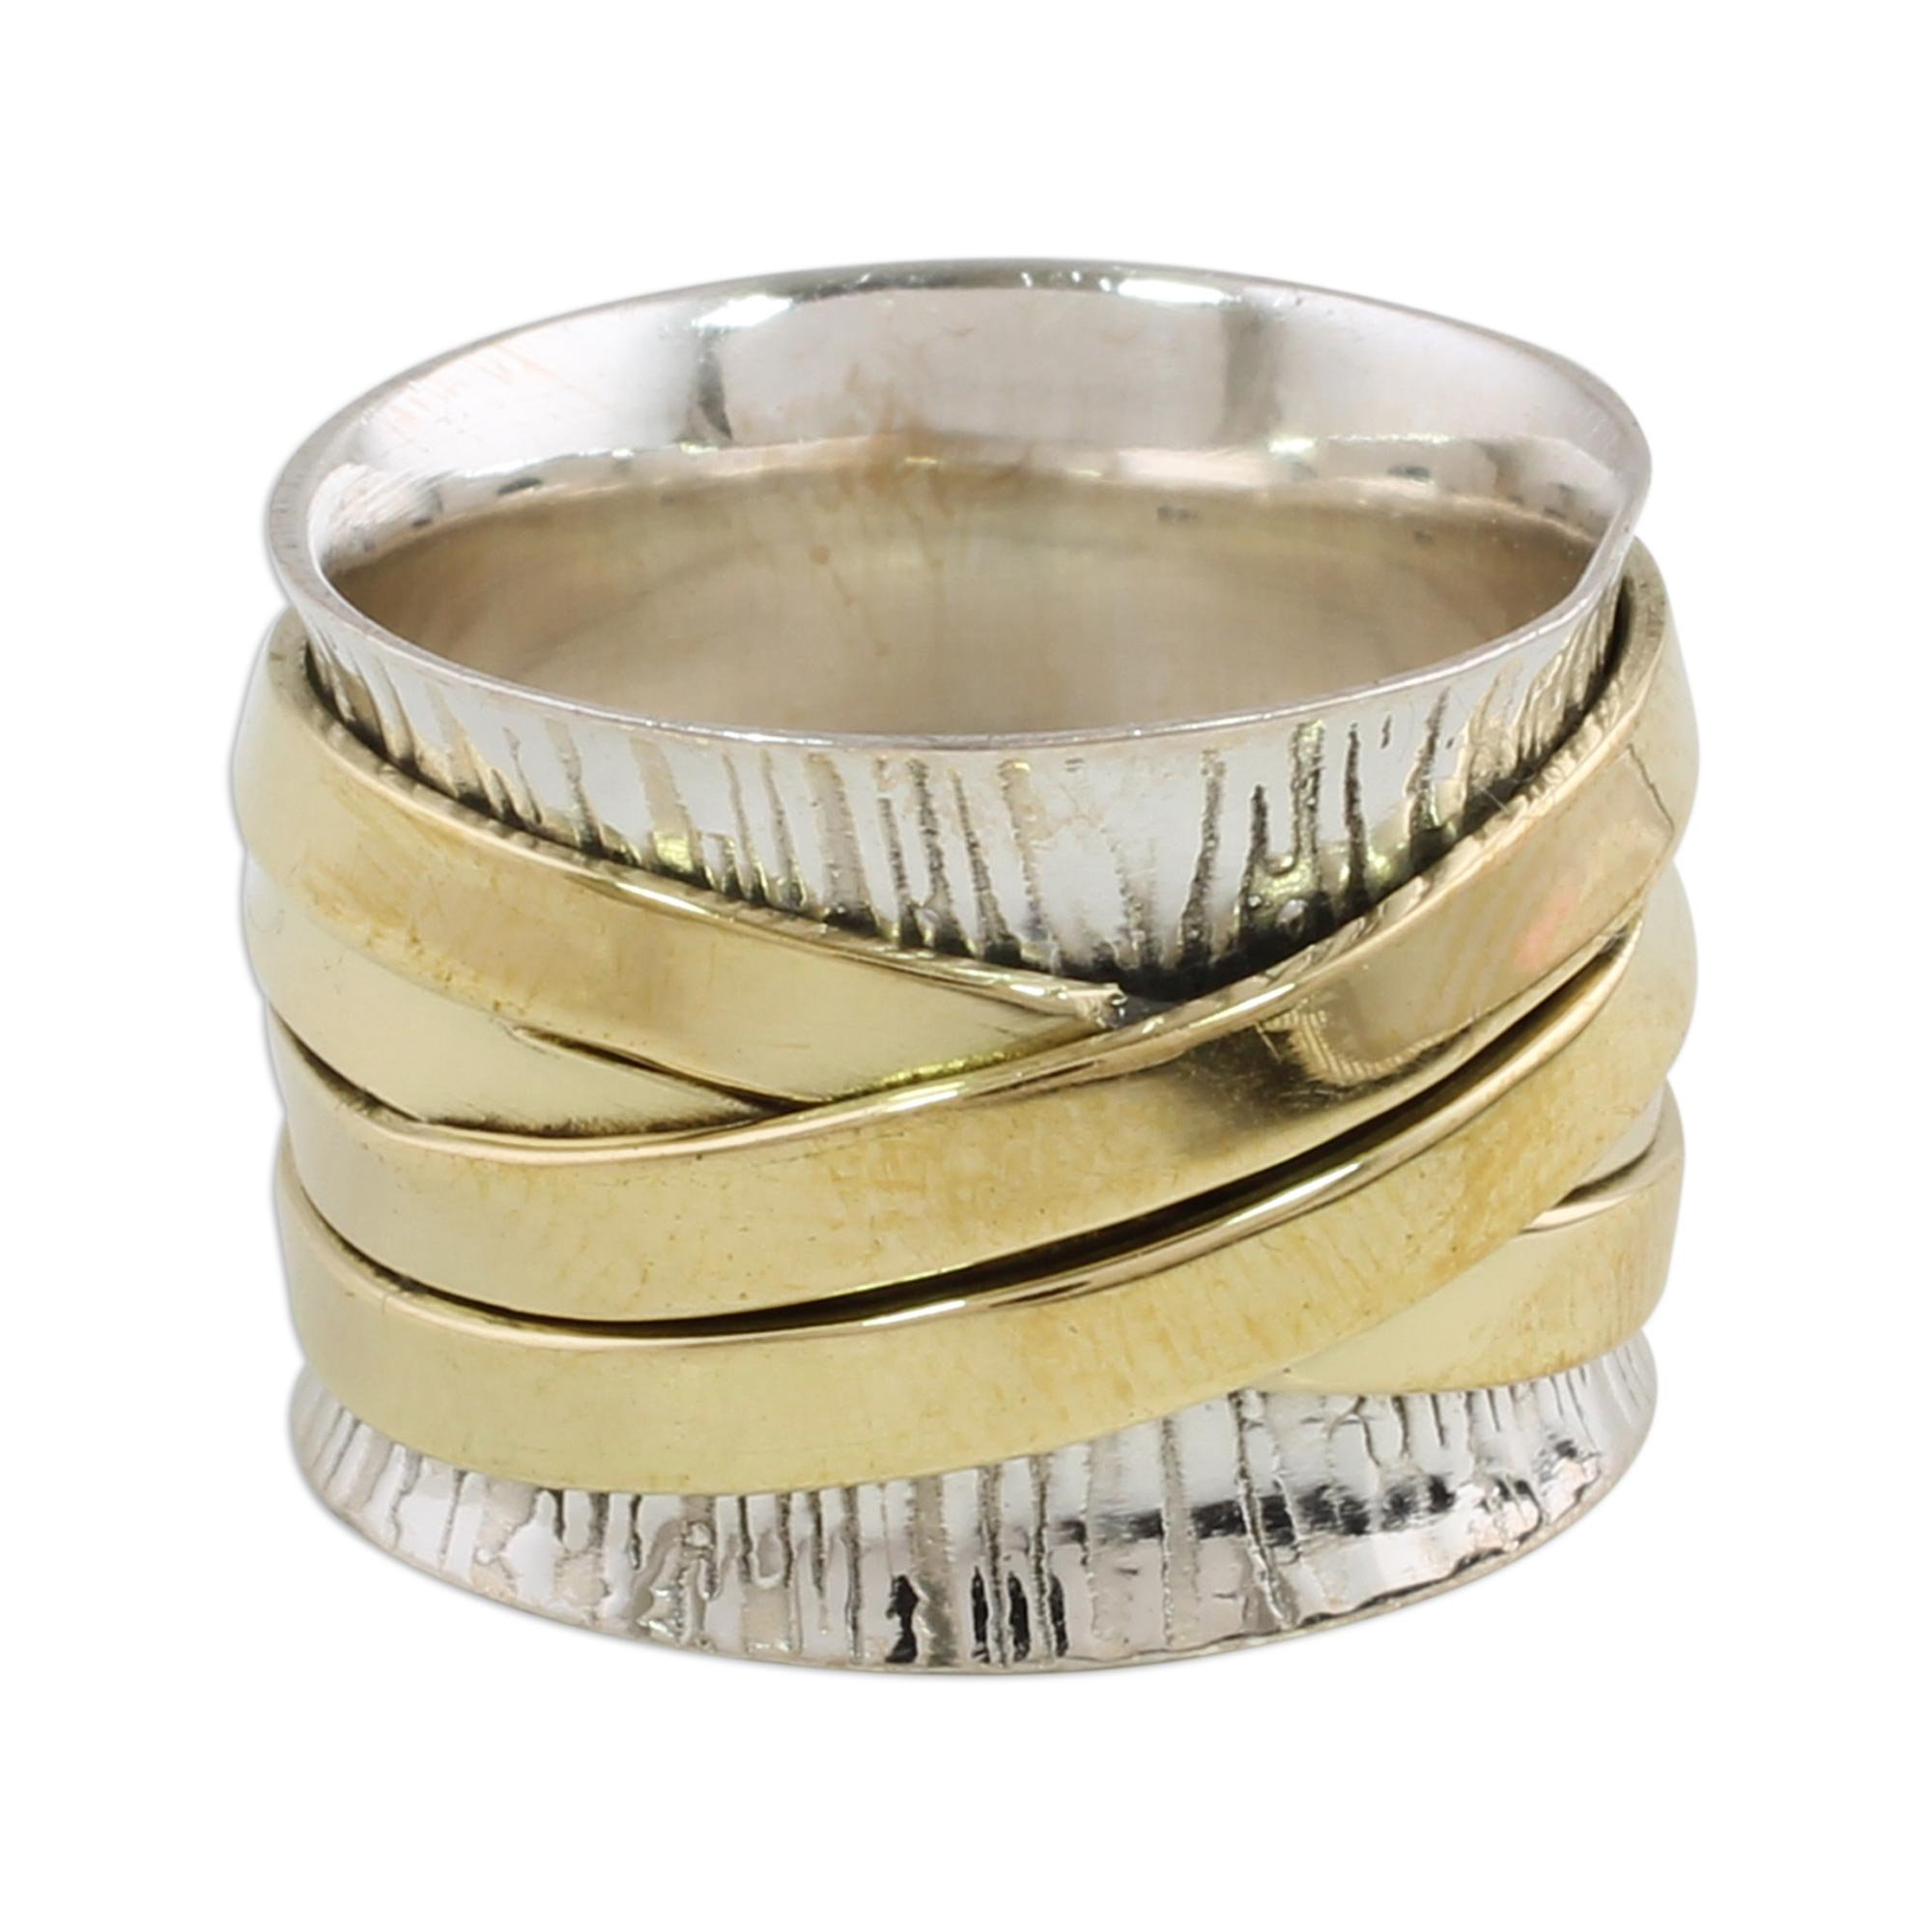 NOVICA .925 Sterling Silver Brass Band Ring 'Crisscrossing Grace'